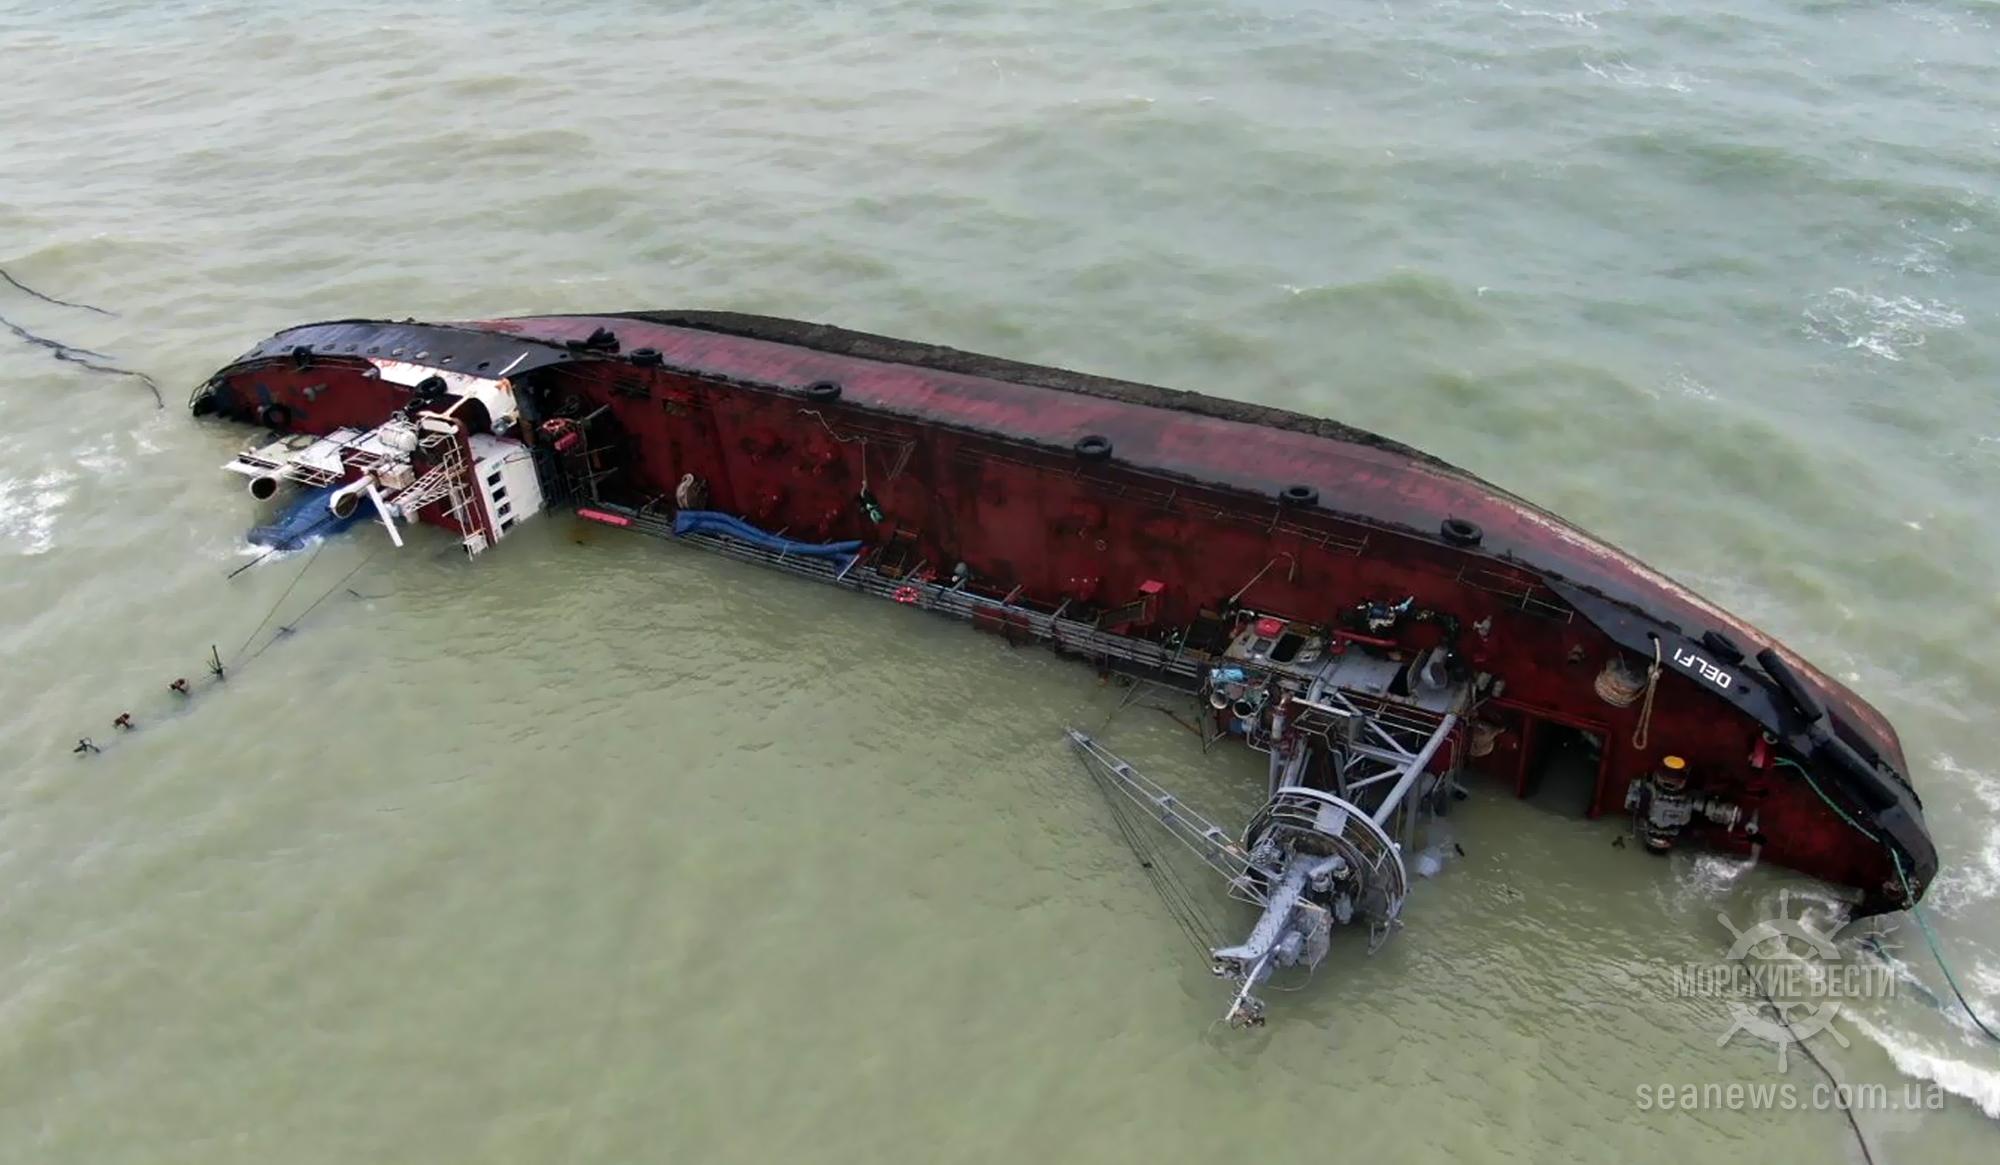 Хронология: Танкер Delfi перед аварией долго стоял в море без топлива и с поломками